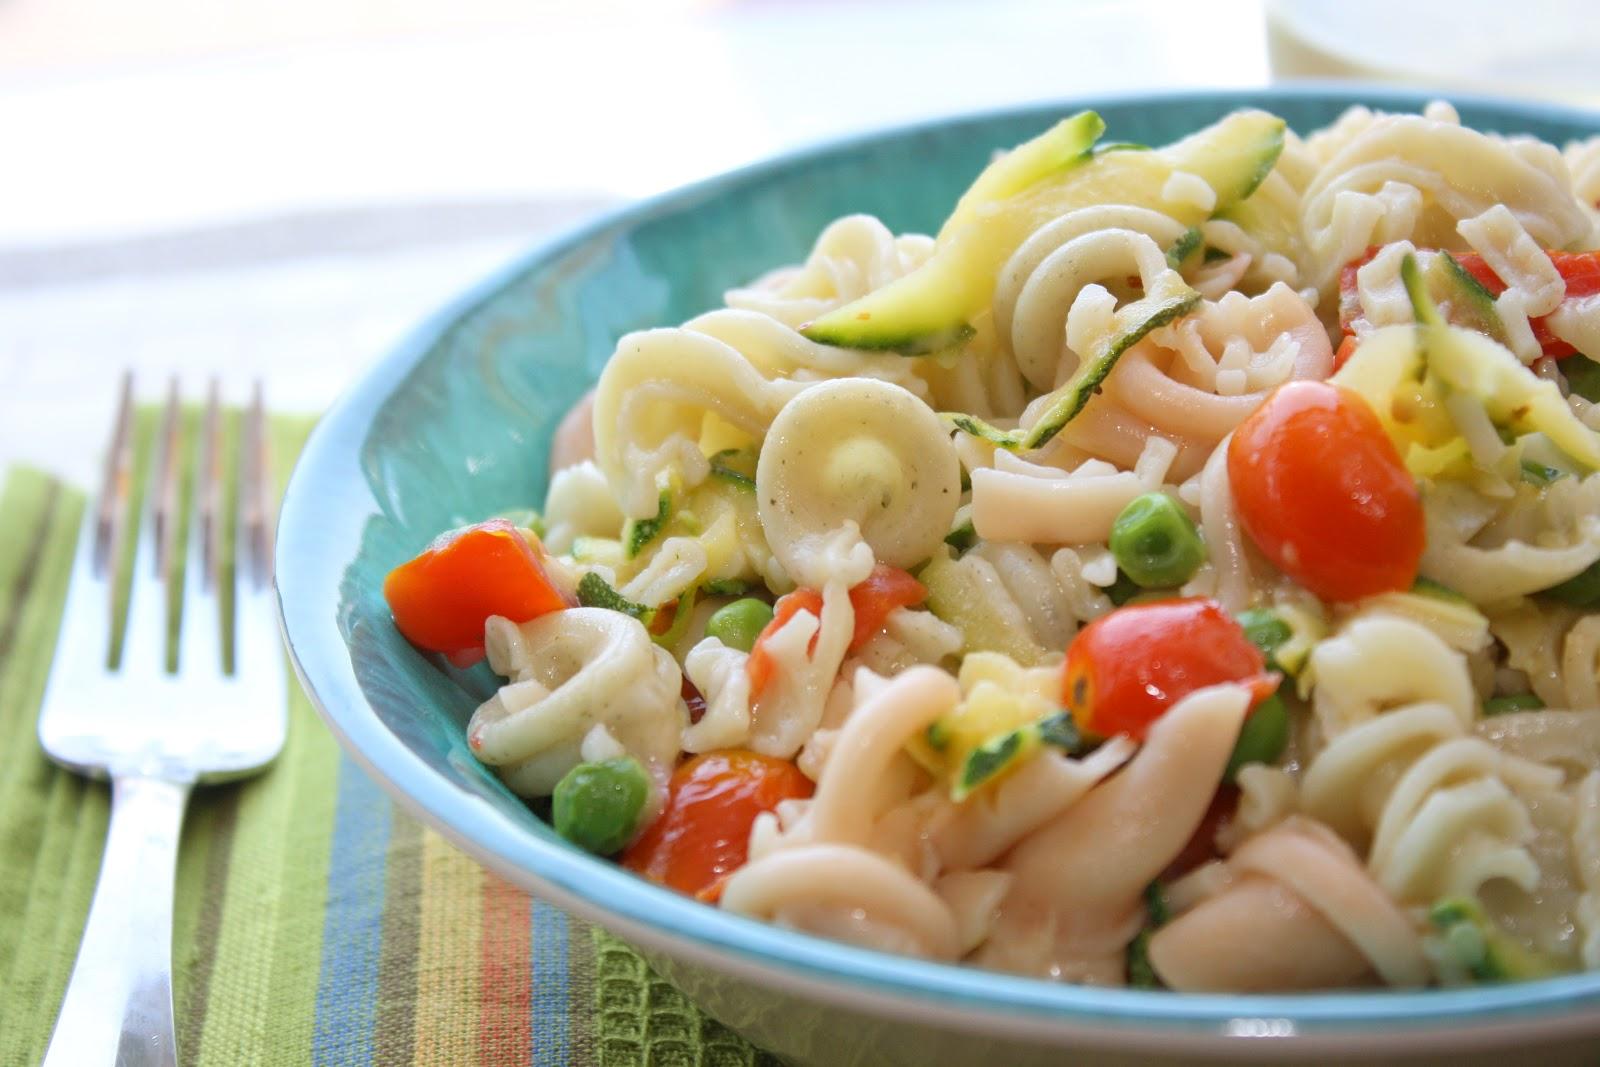 The Bitchin' Kitchin': Spring Vegetable Pasta